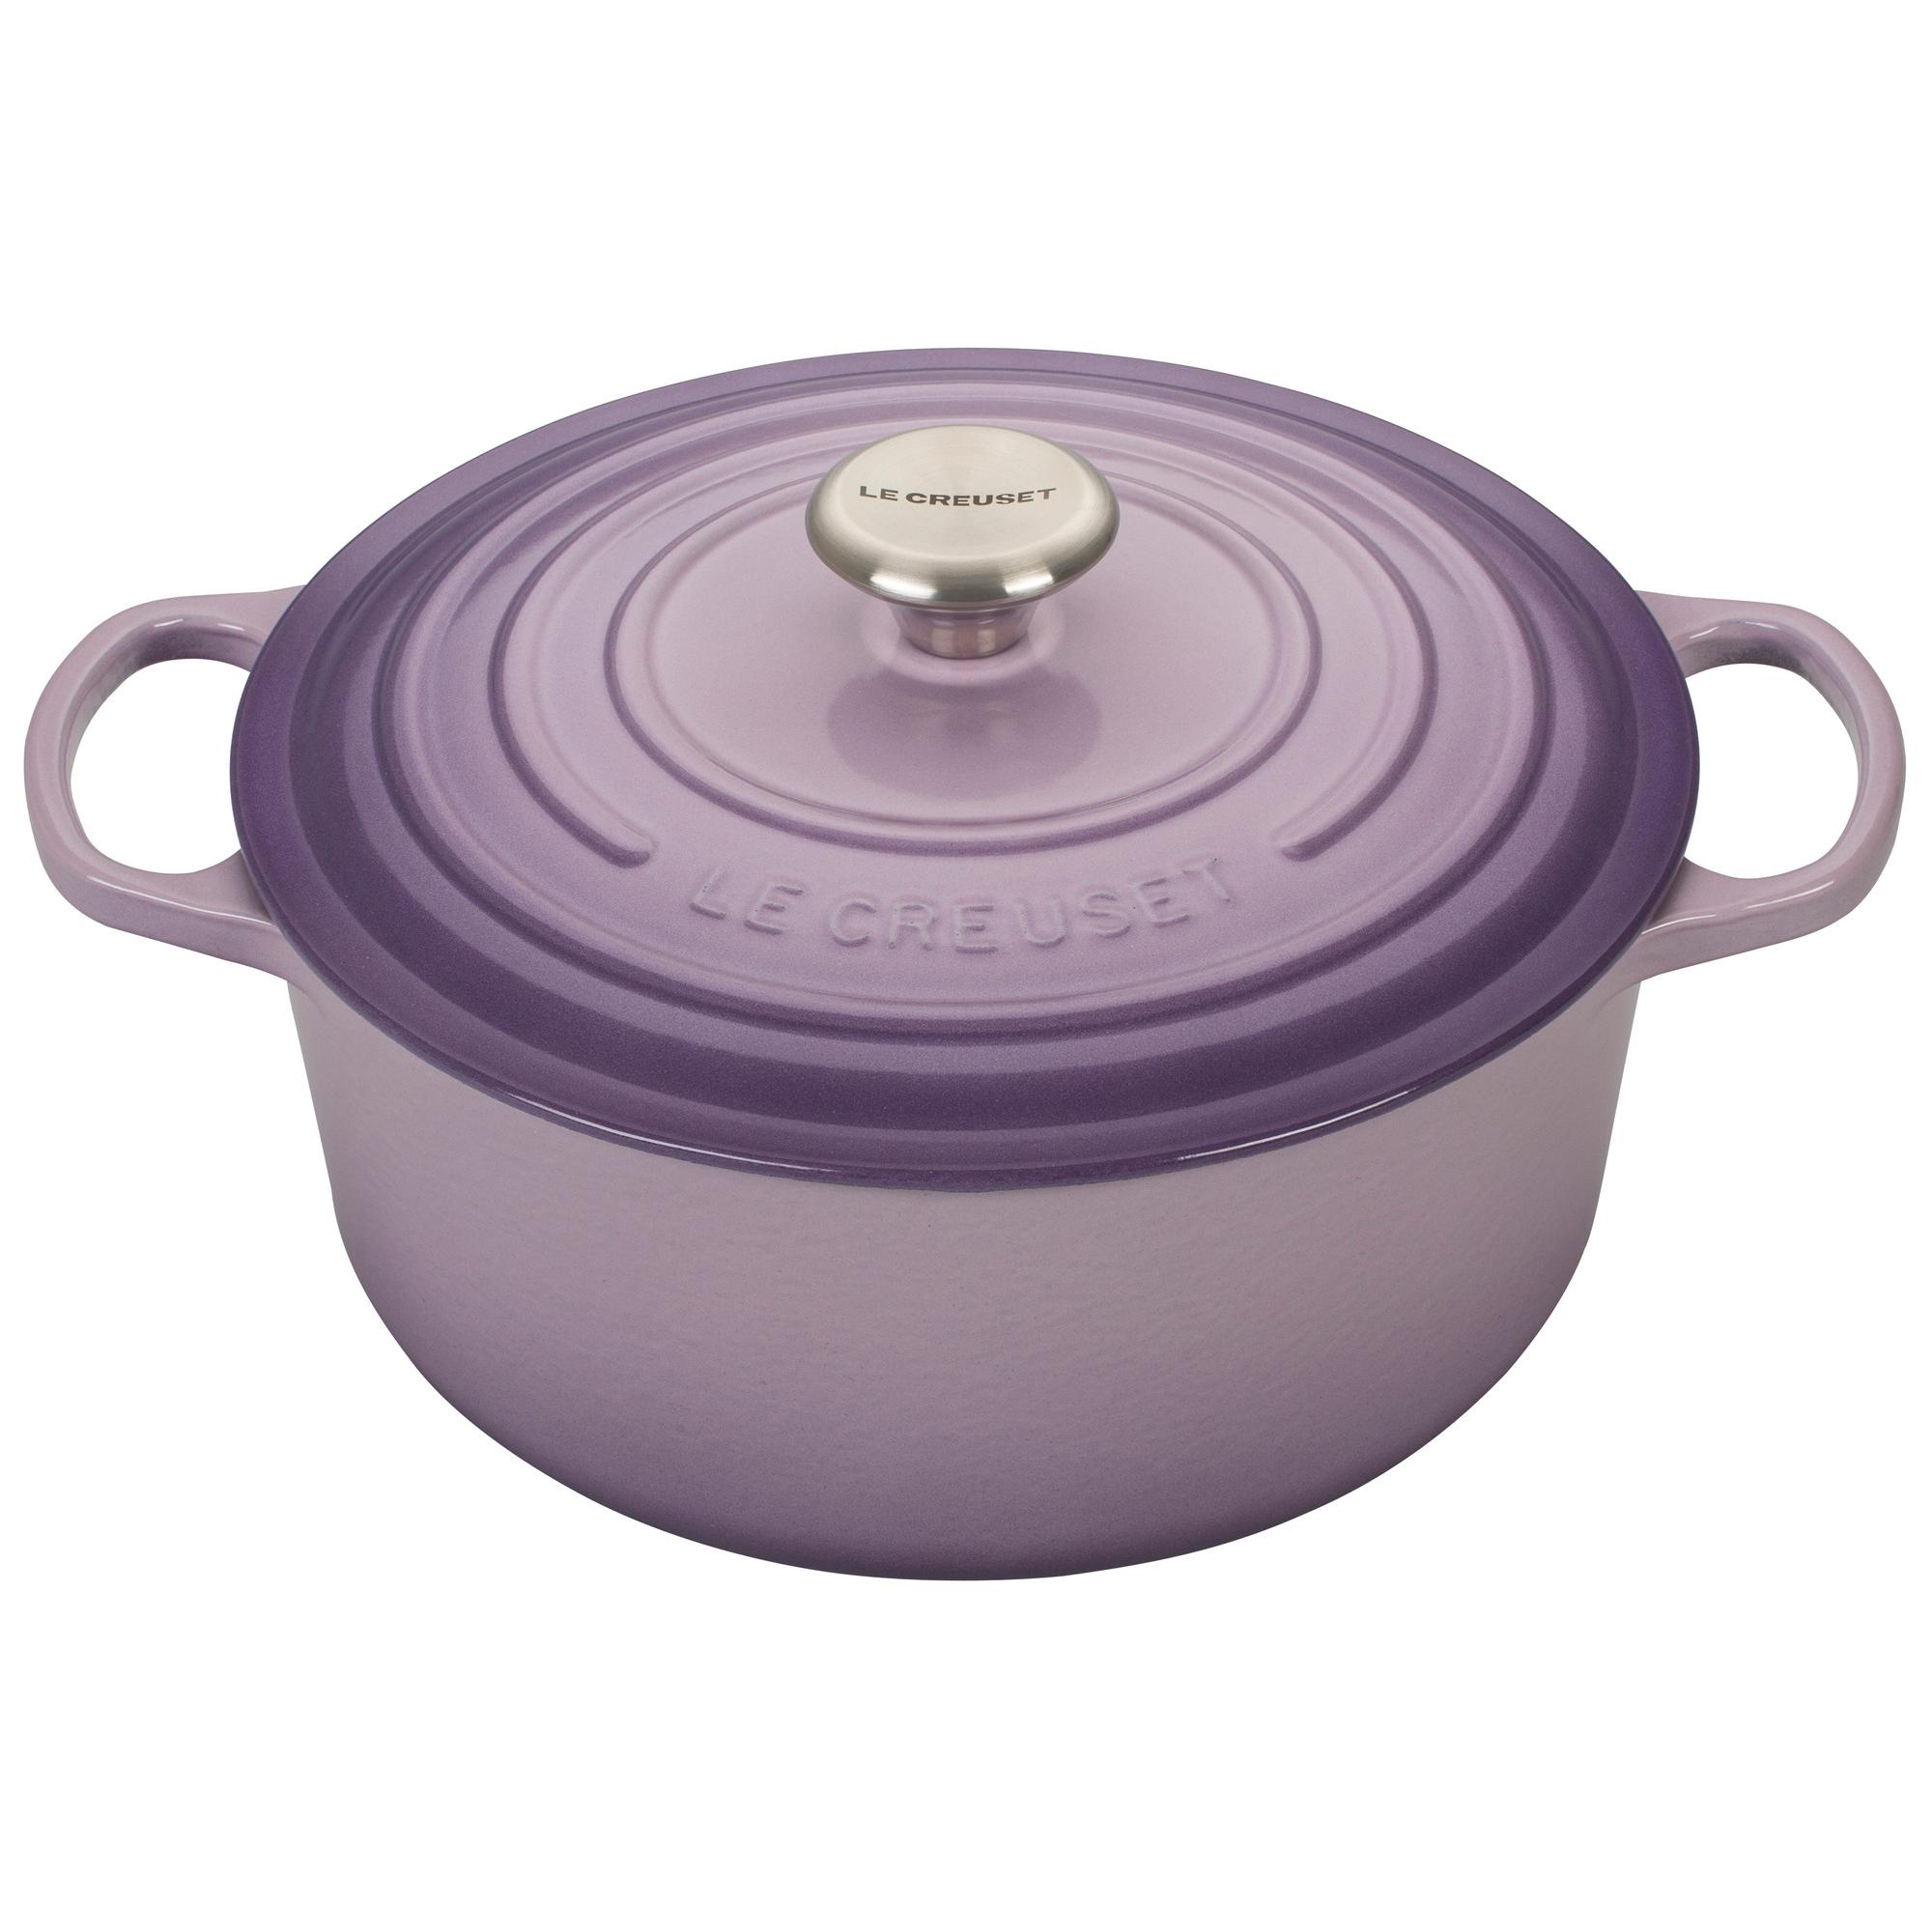 Le Creuset Signature Provence Enameled Cast Iron 5.5 Quart Round Dutch Oven